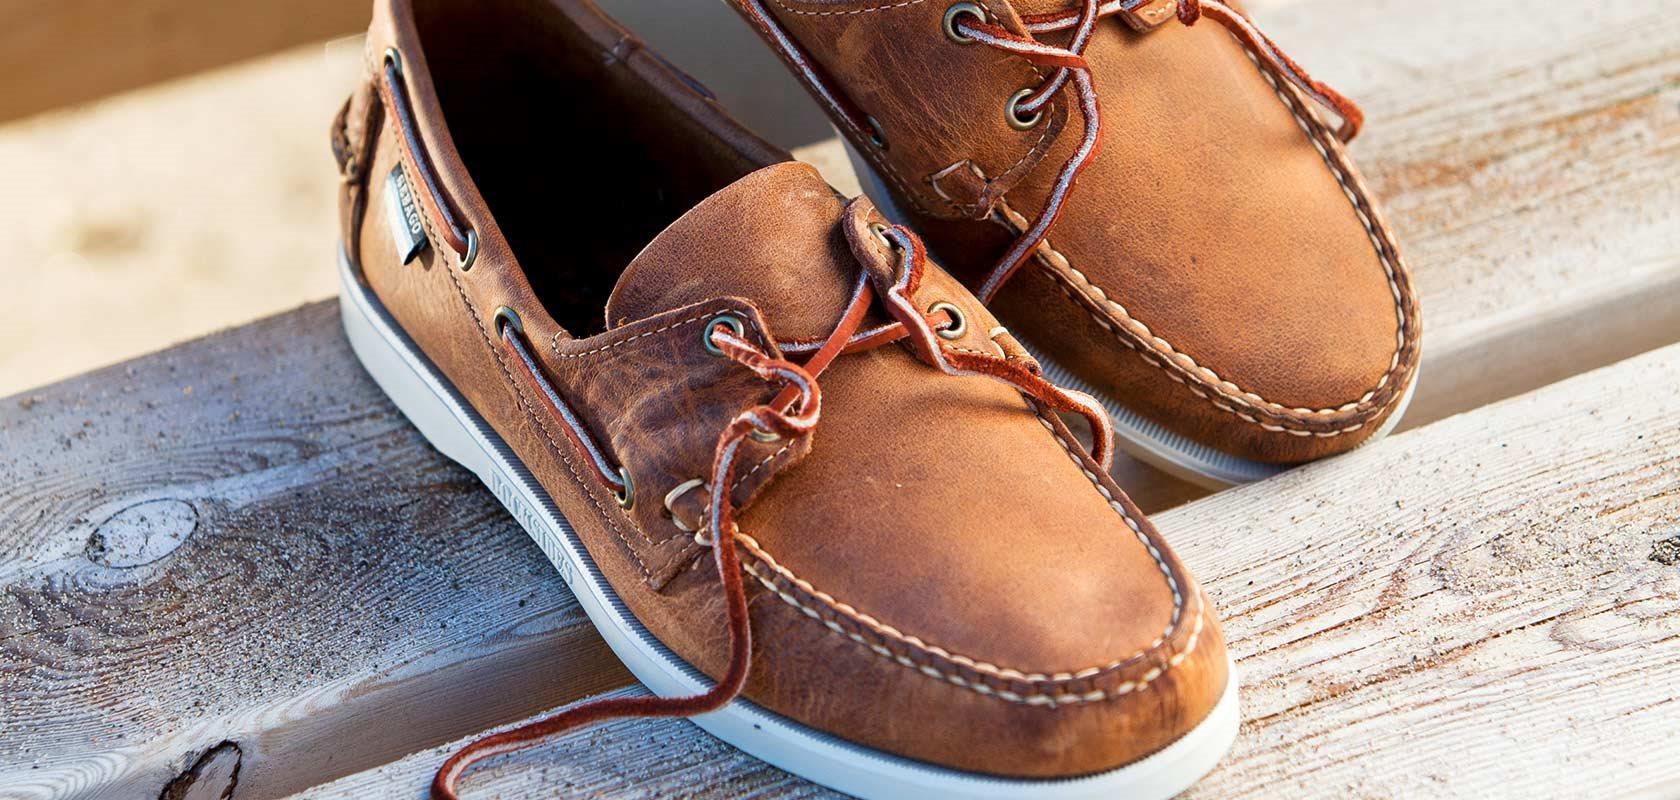 Sebago Docksides sejlersko Køb Sebago sko online